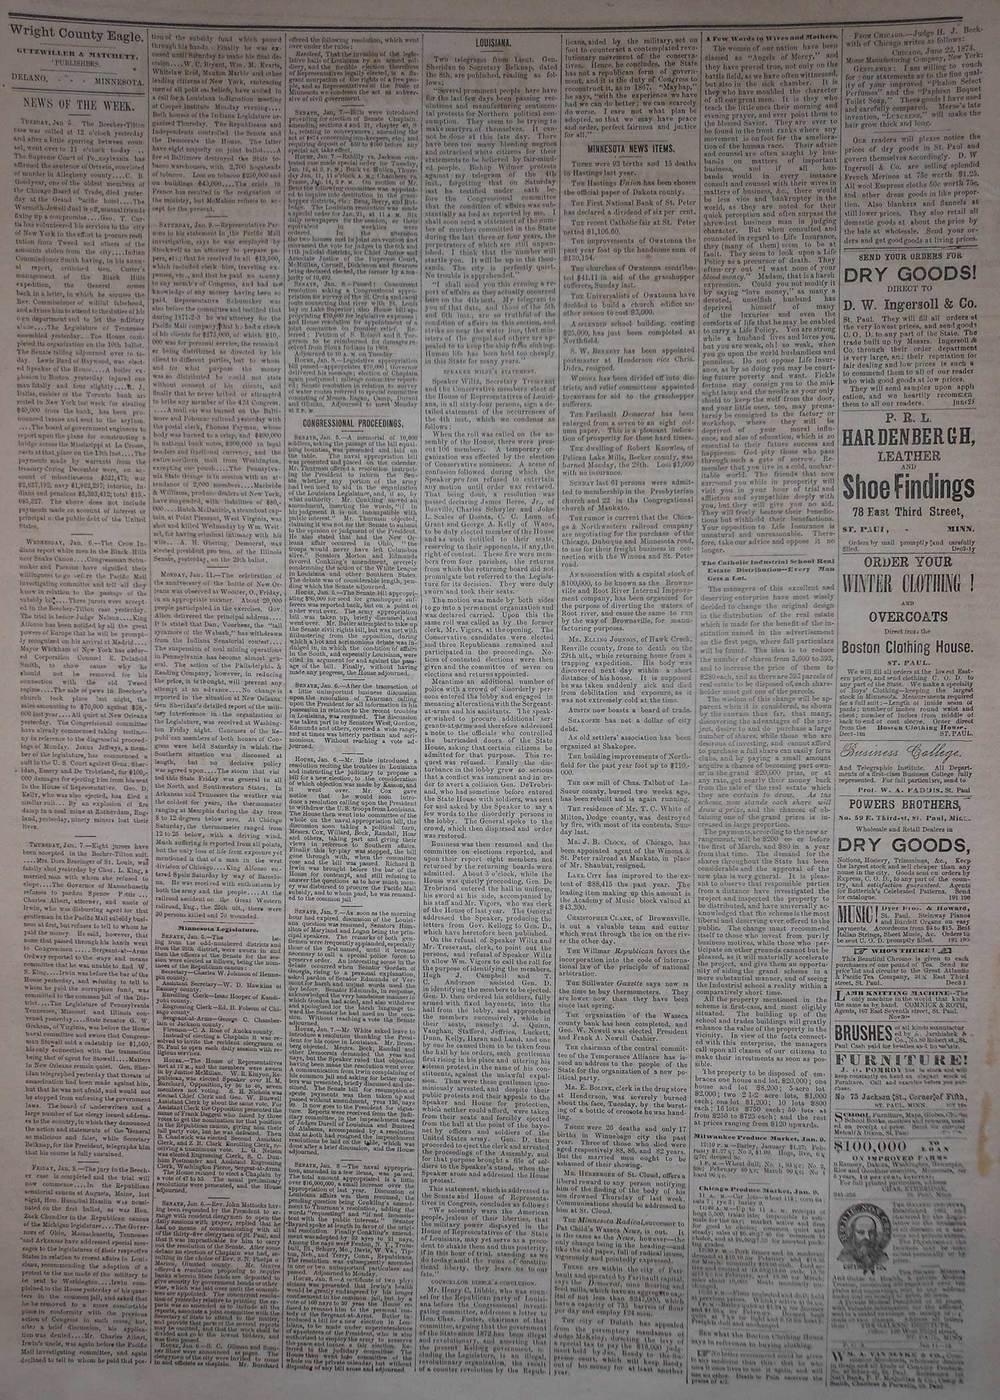 1/13/1875, p2